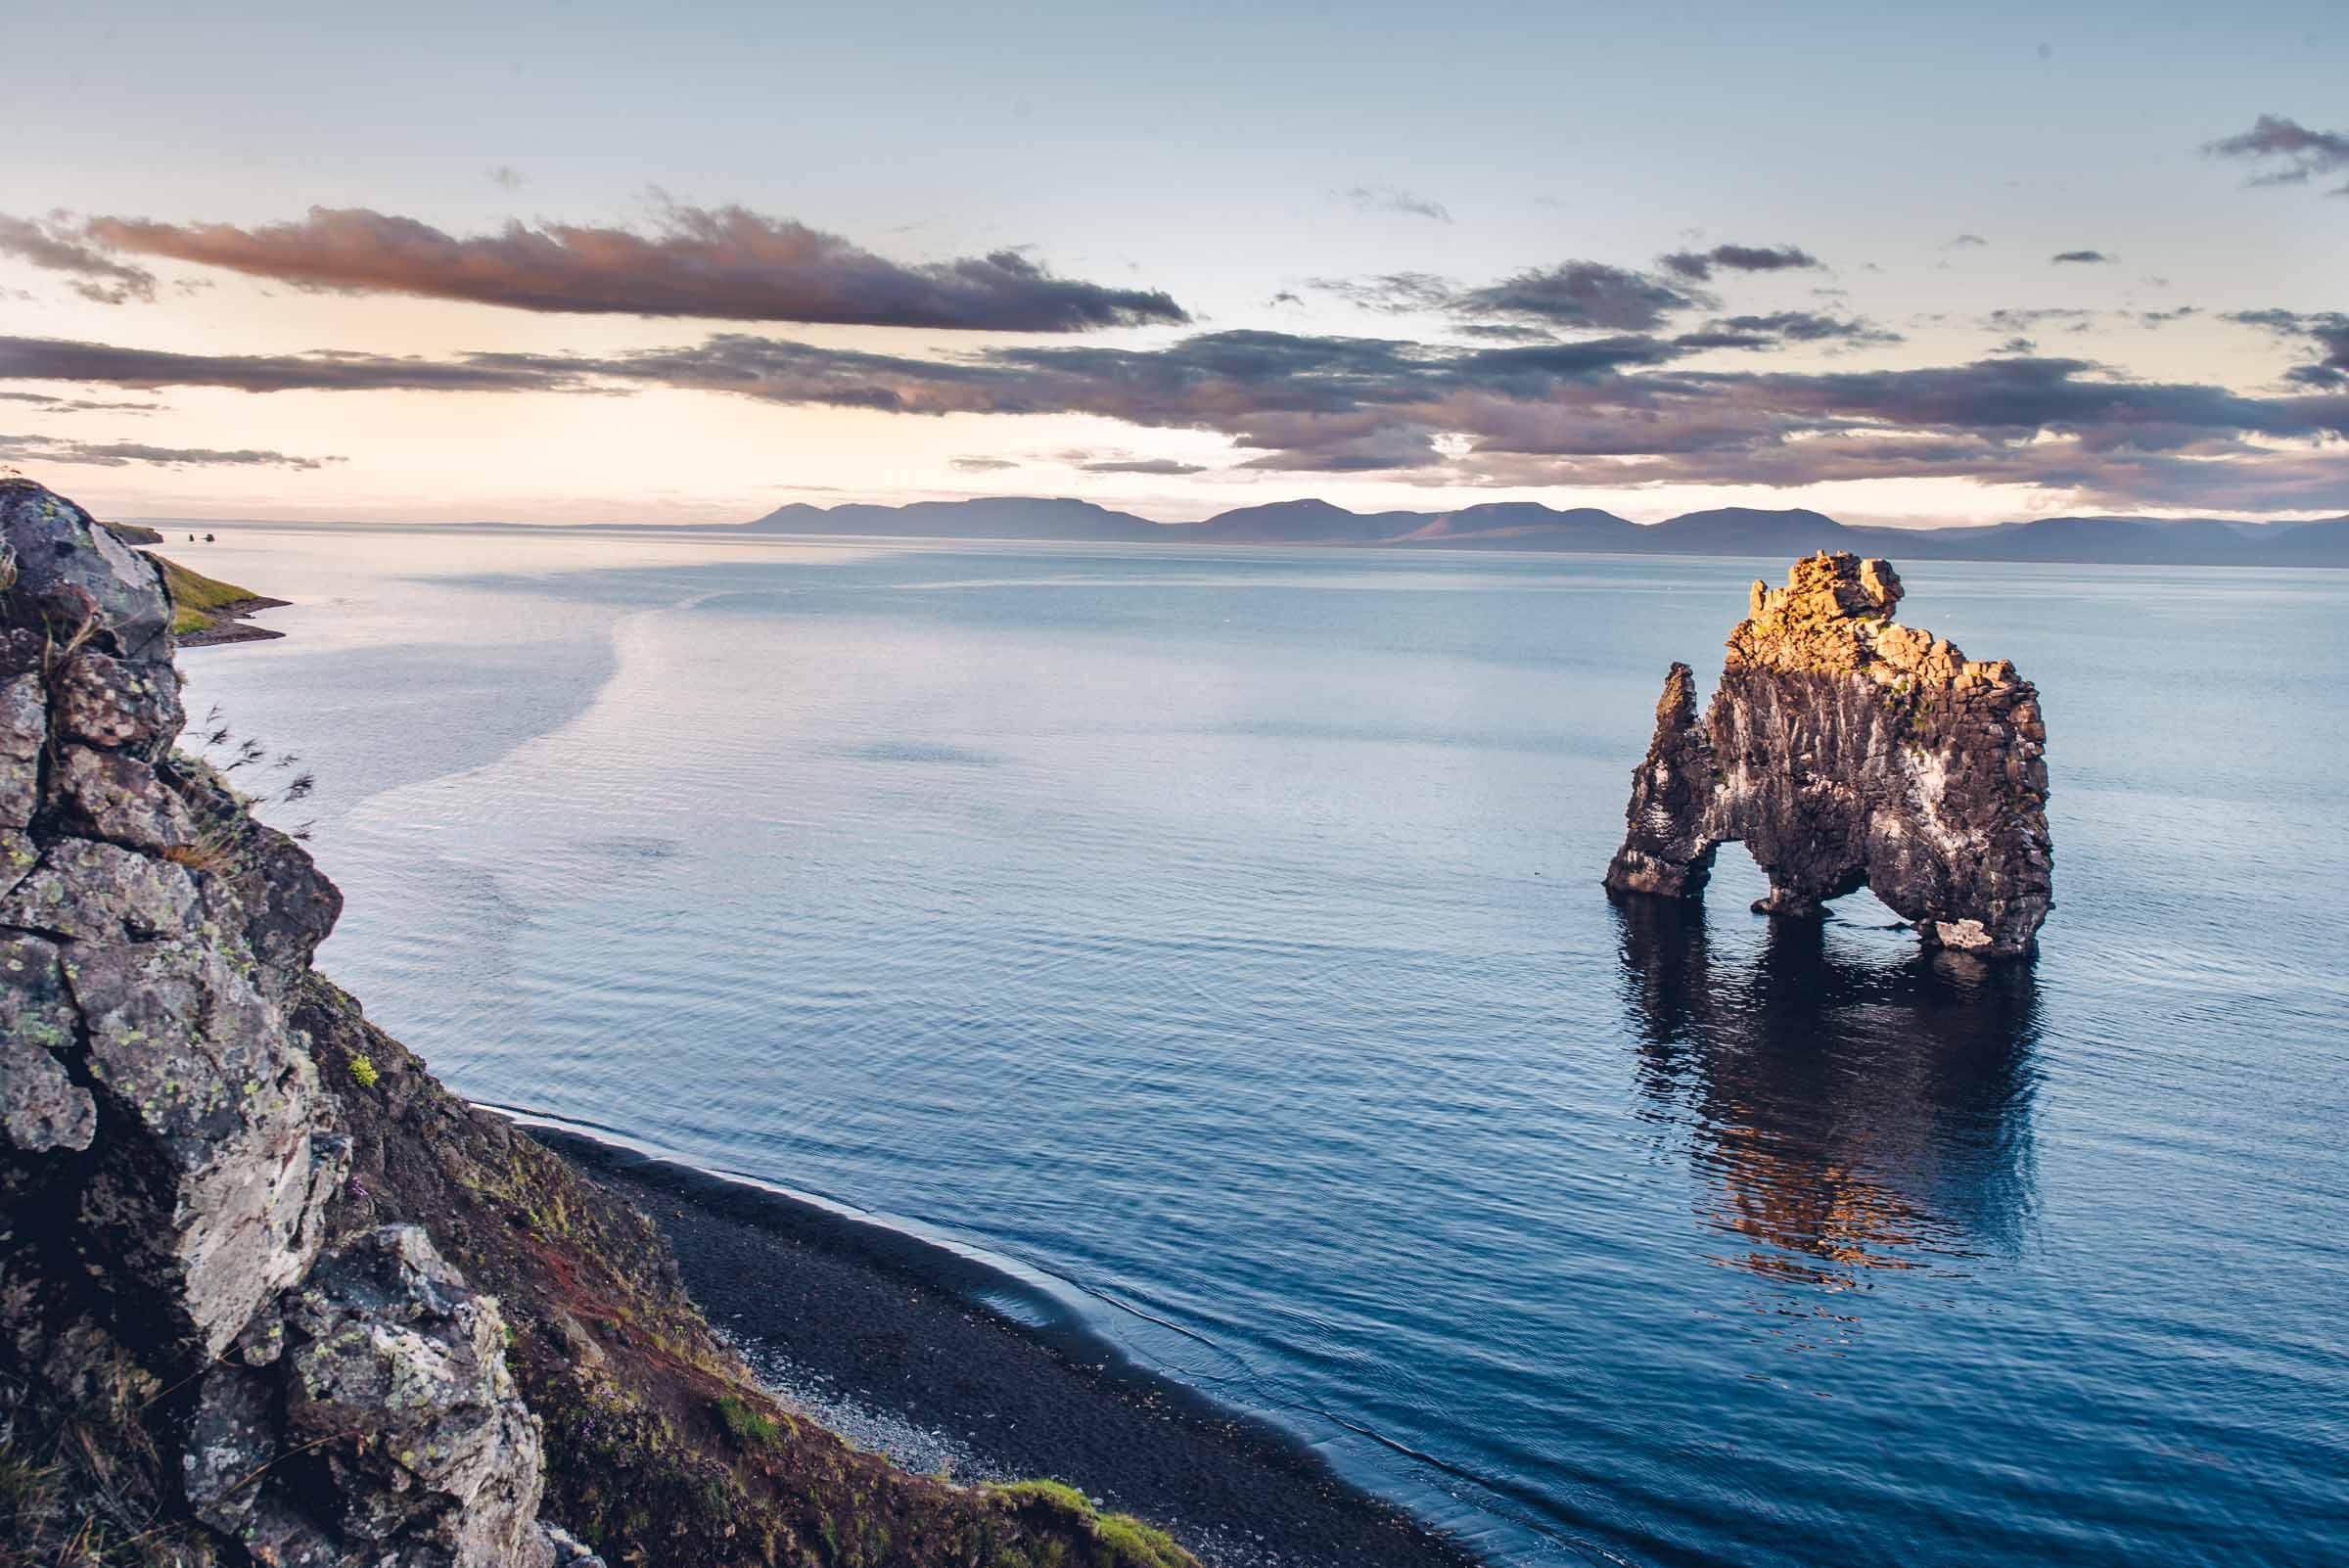 Hvítserkur Rock Formation - The Troll of North-West Iceland